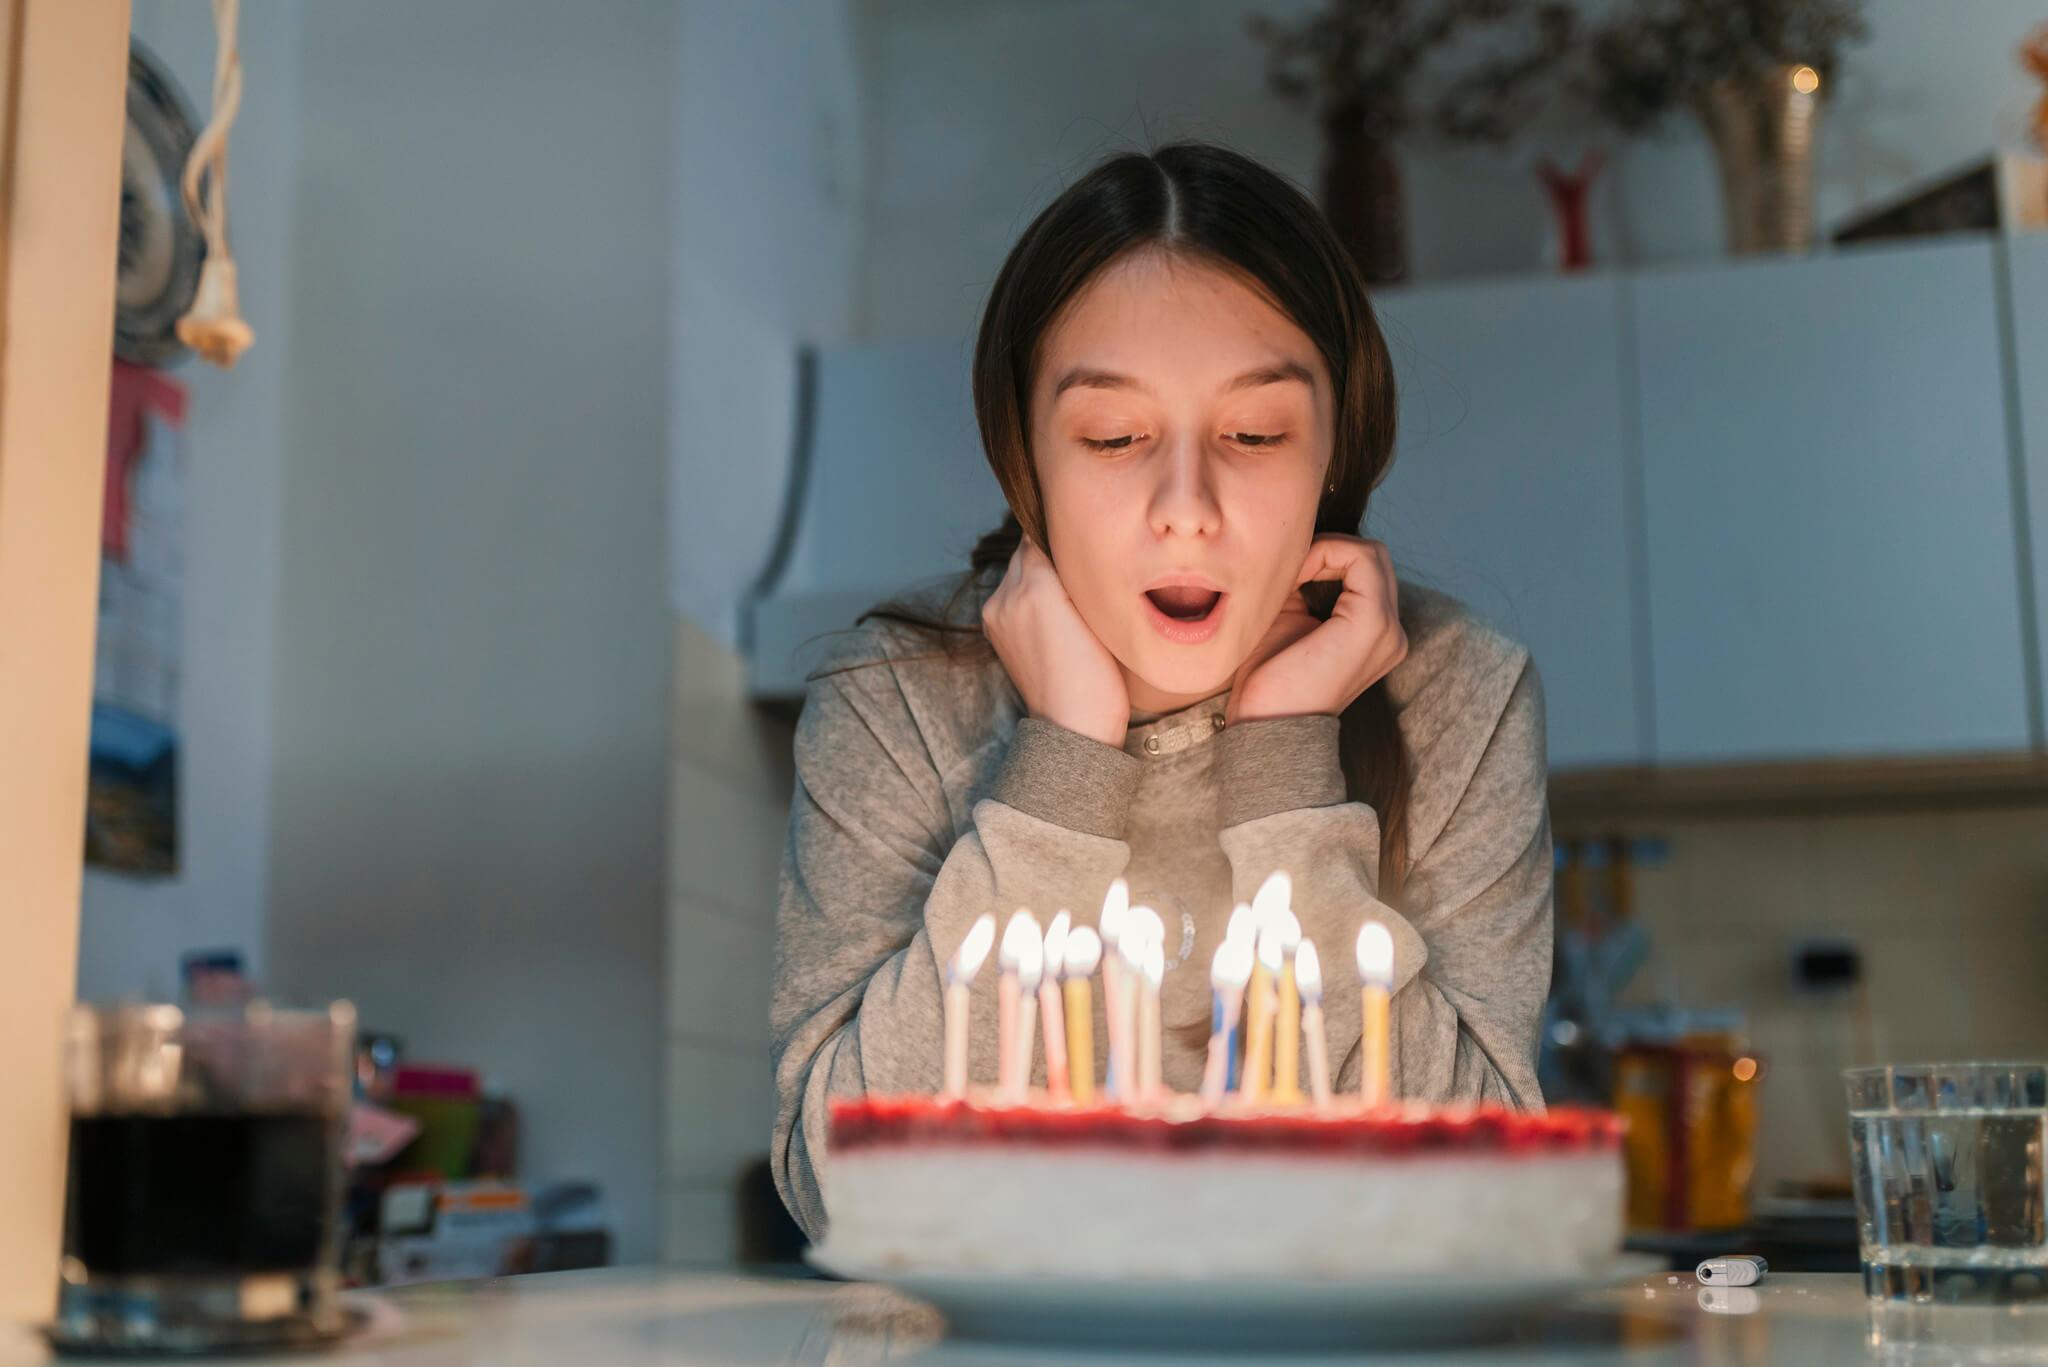 13-Year-Old Birthday Ideas